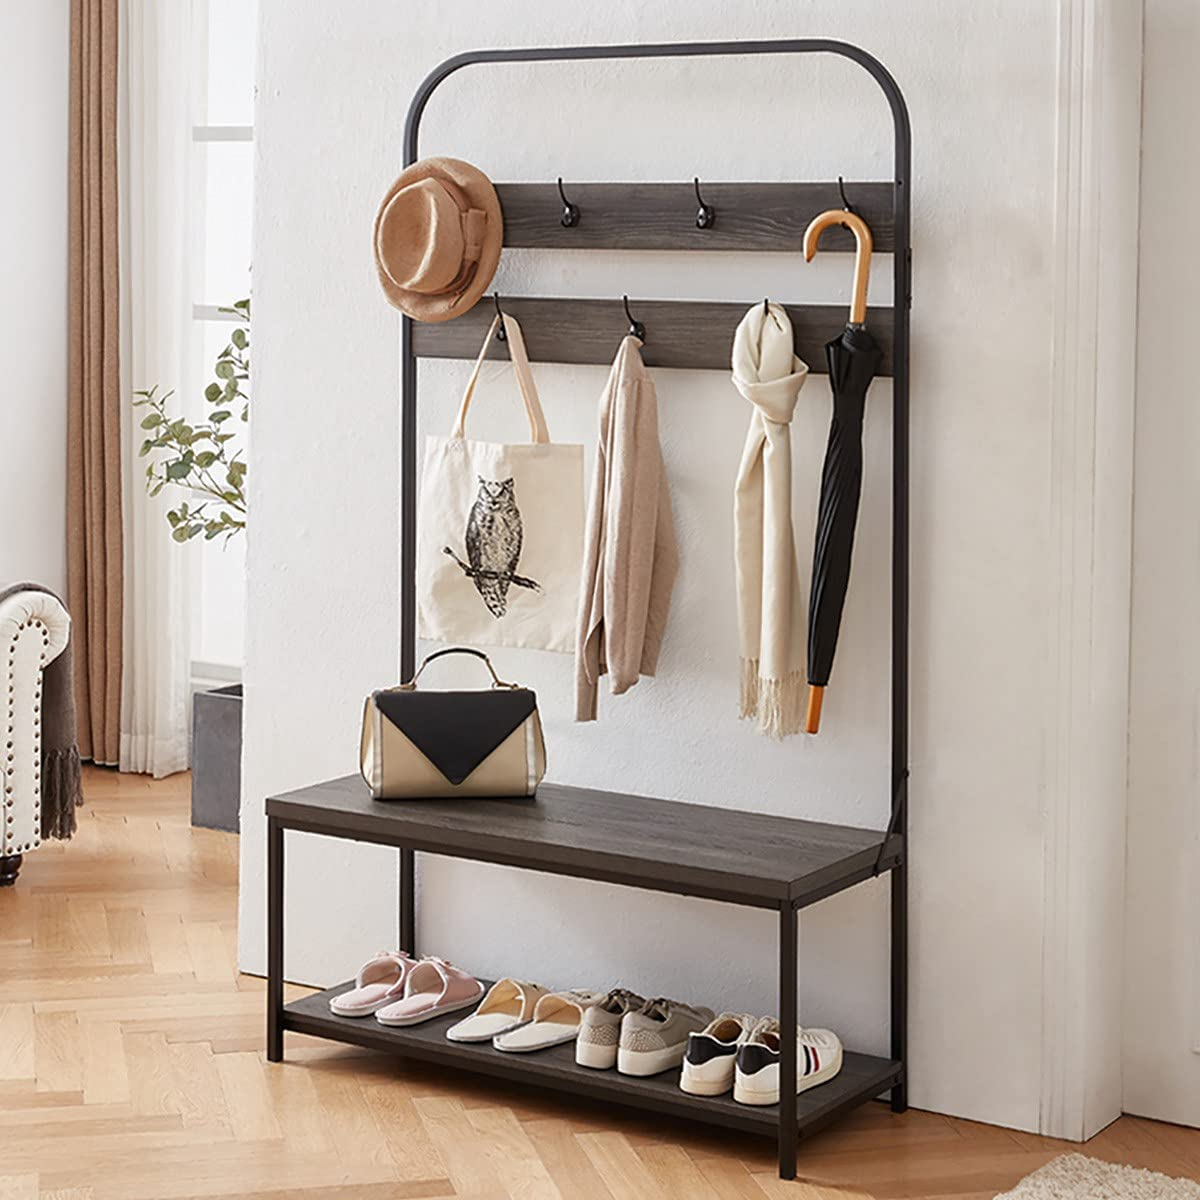 IBF Coat 新登場 Rack with Shoe Bench Ben 新作 Hall Tree Storage 3-In-1